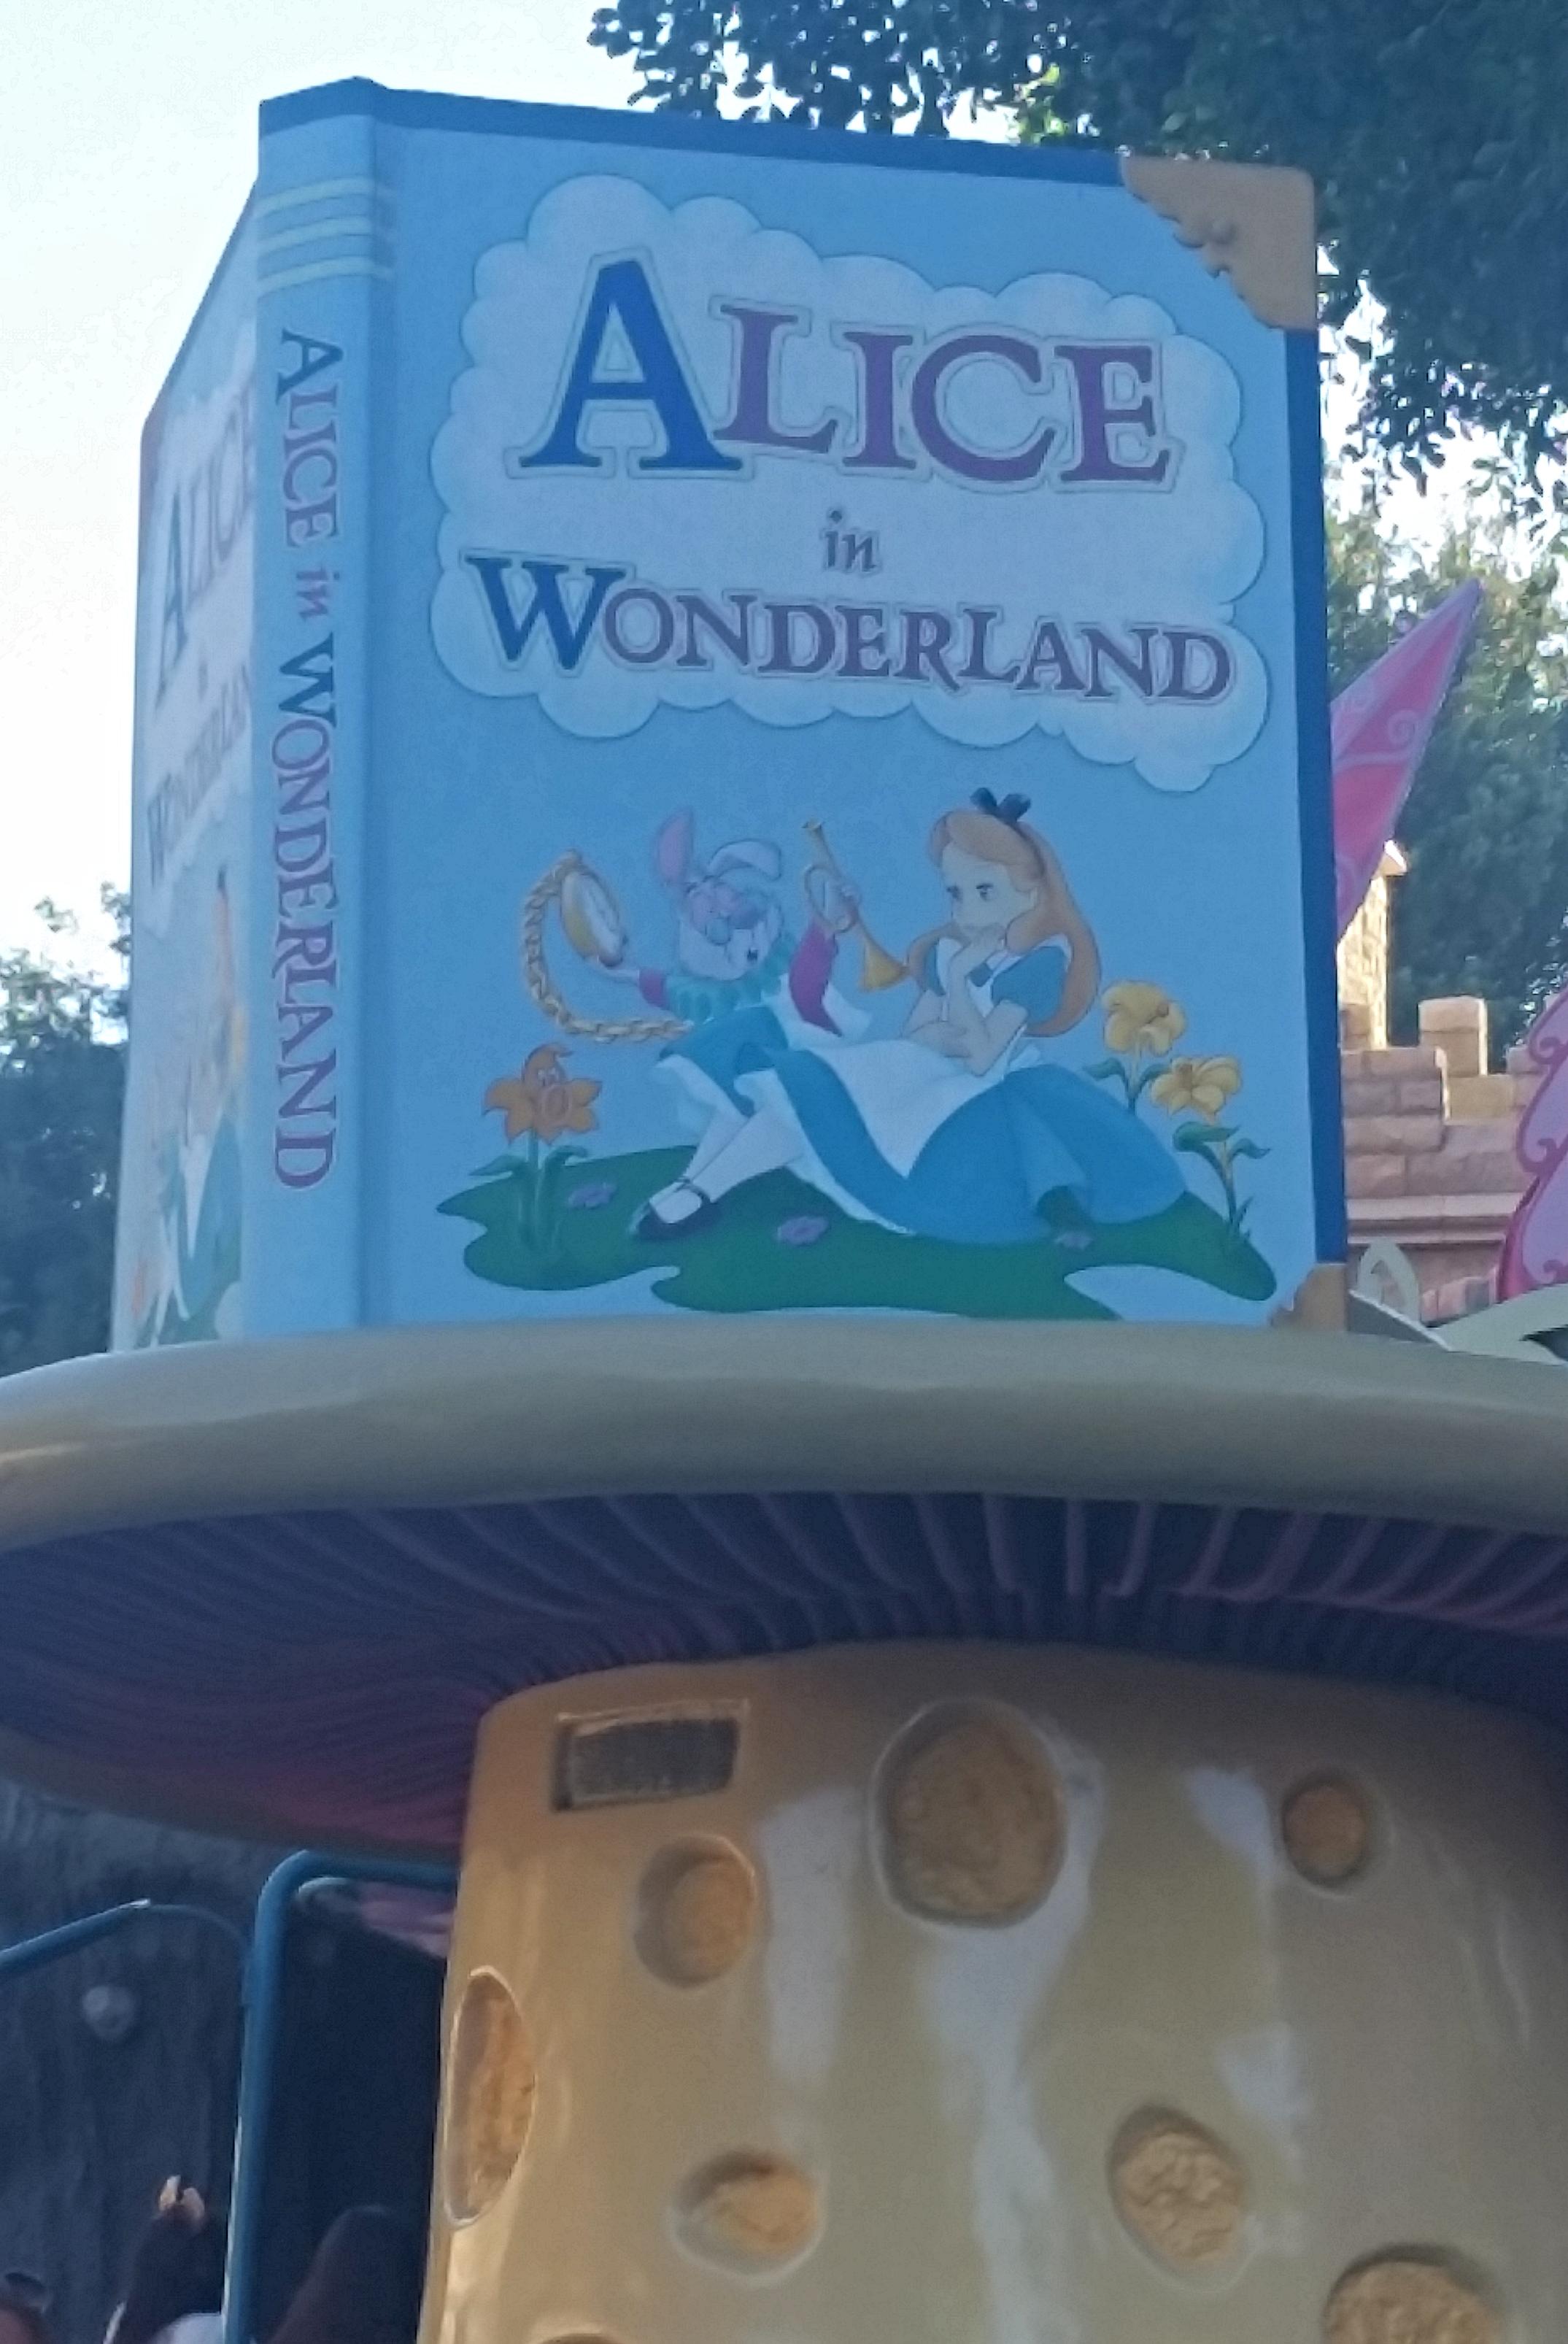 Disneyland vs. Disney World: When to Choose Disneyland